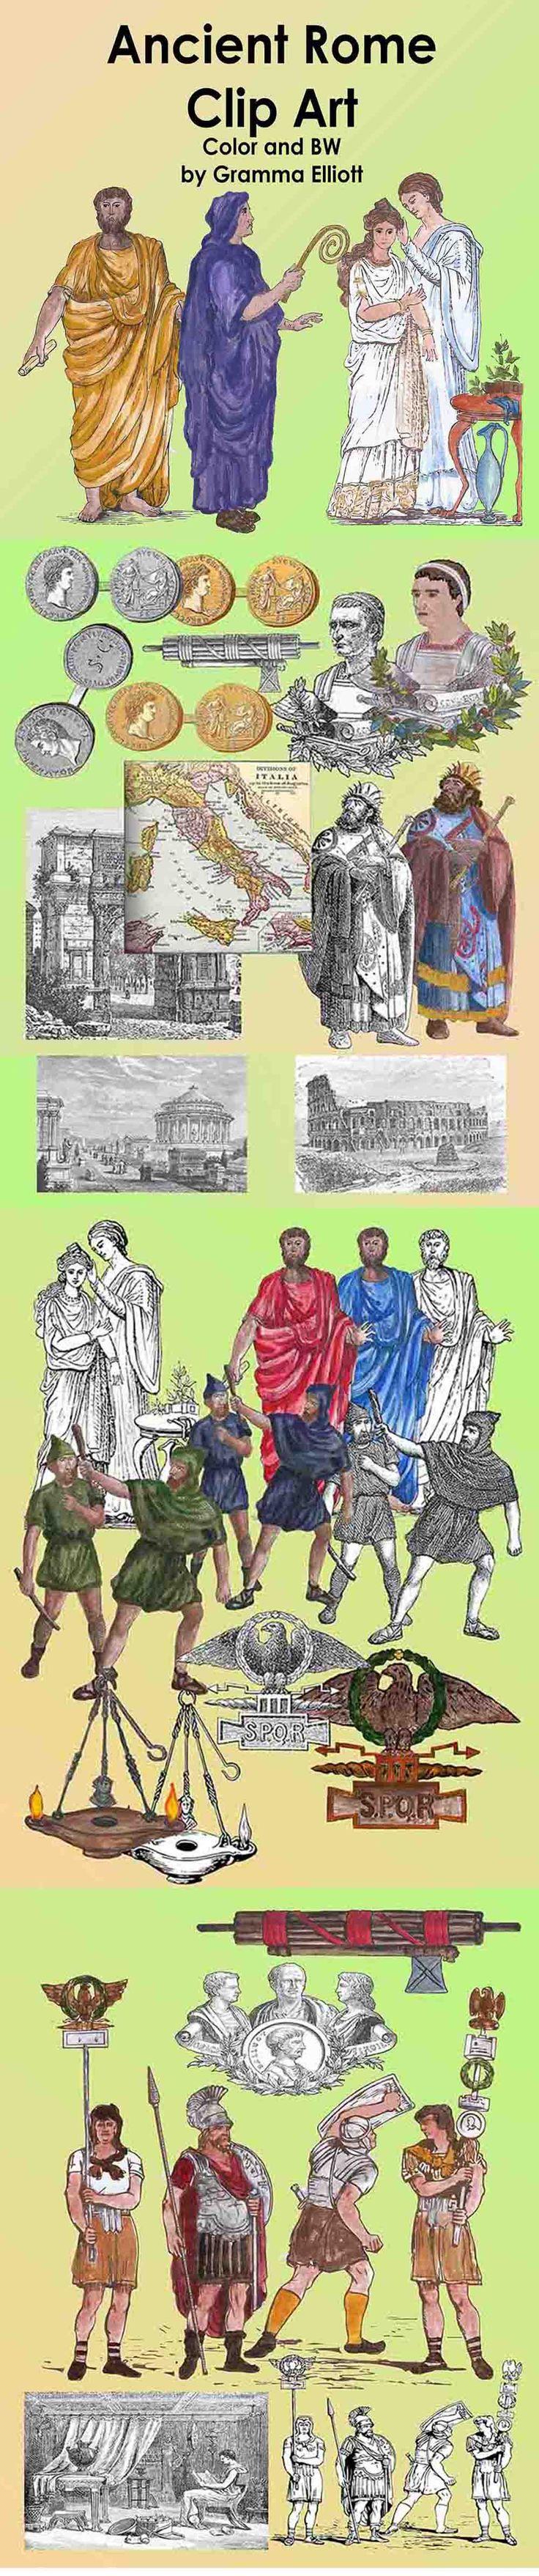 Rome clipart ancient ruin Roman best on Art BW